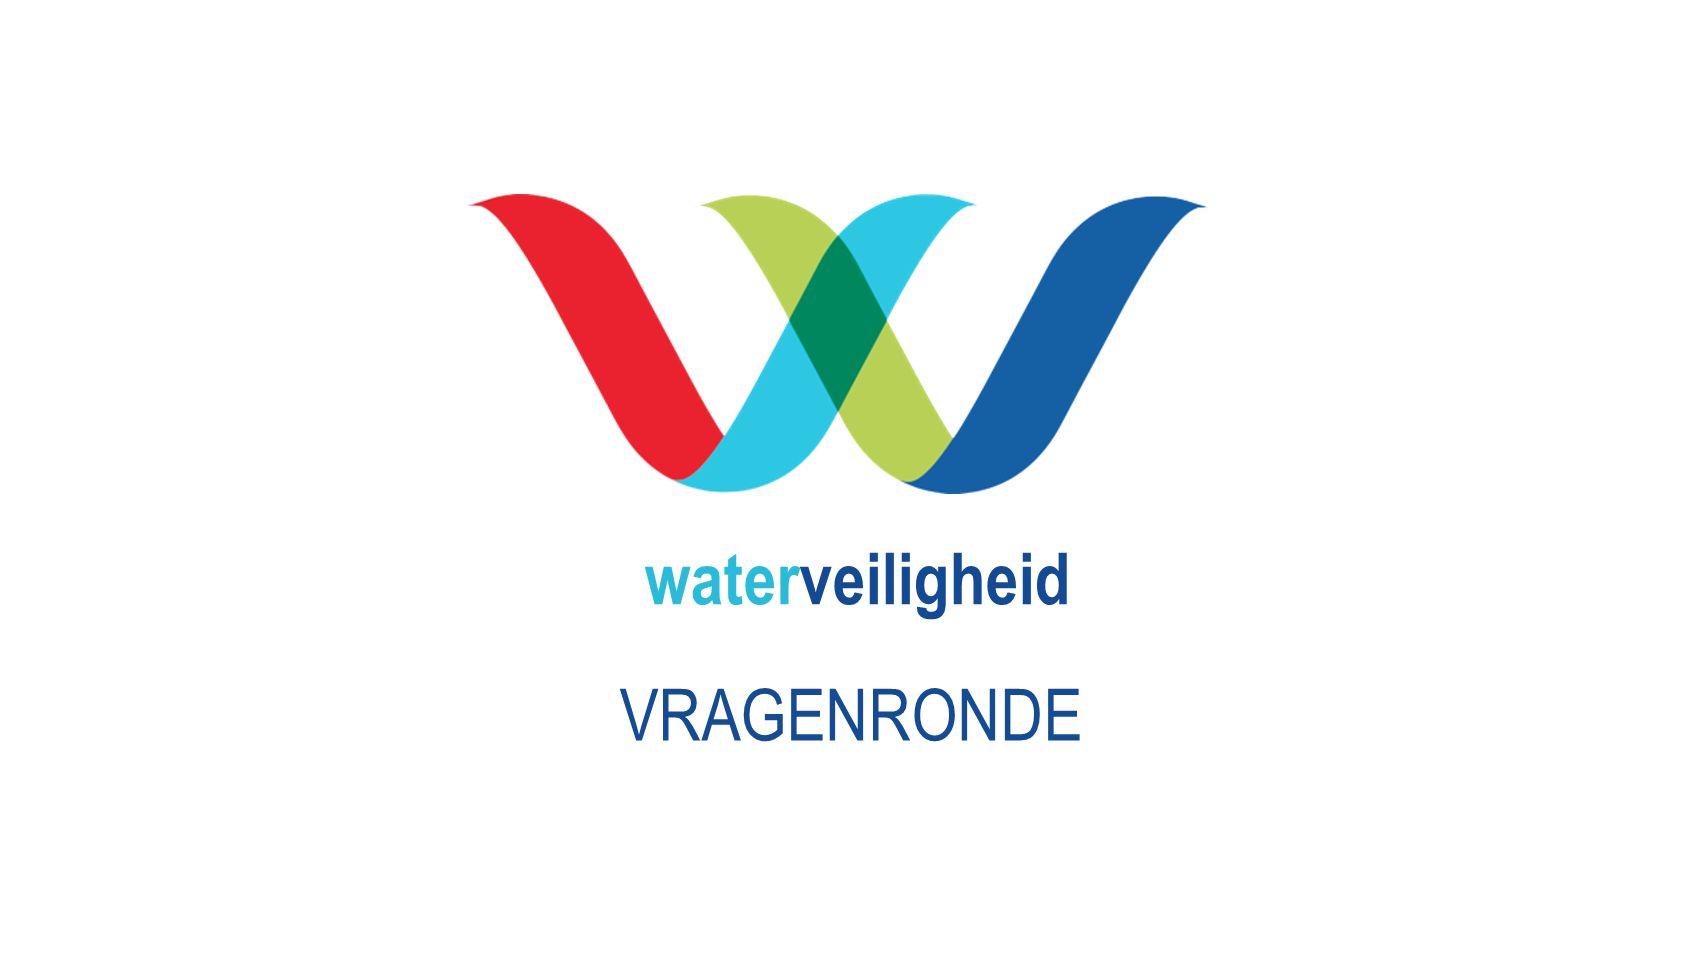 waterveiligheid VRAGENRONDE